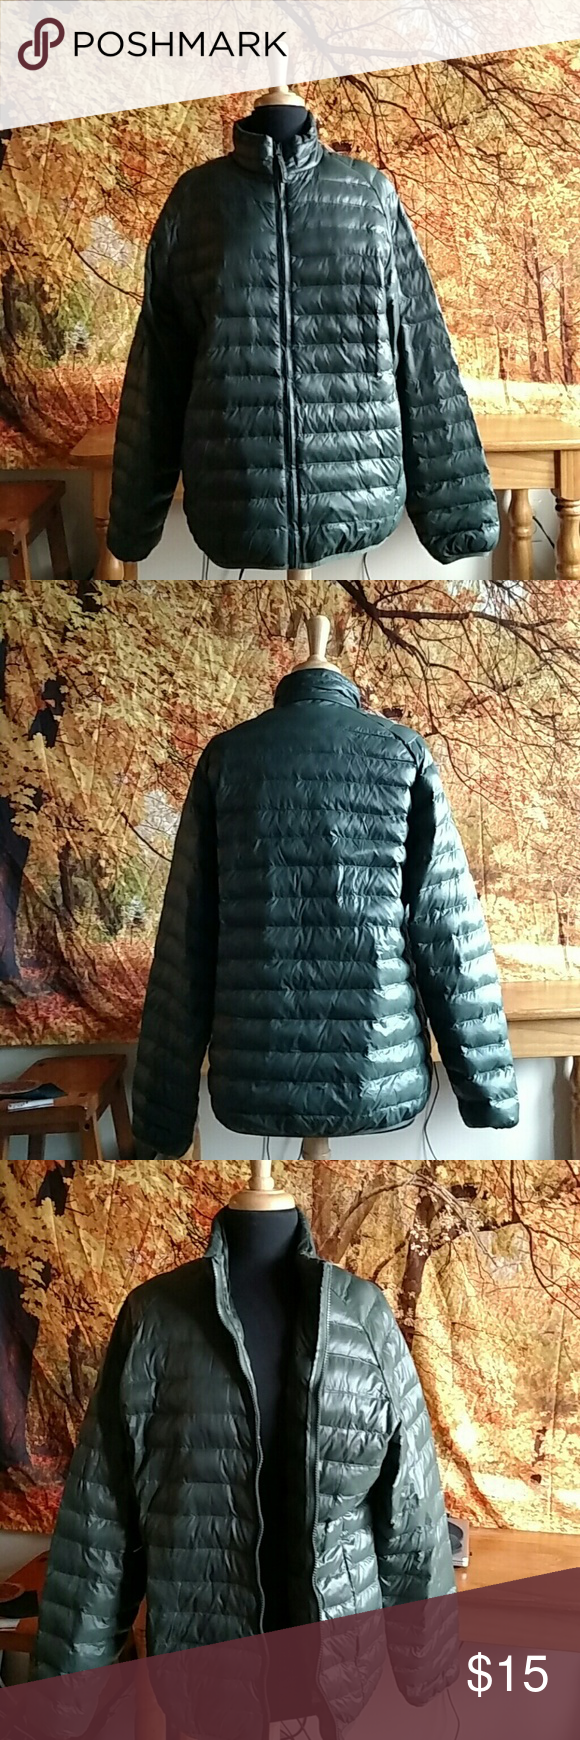 Winter Jacket Lightweight Winter Jackets Jackets Outerwear Jackets [ 1740 x 580 Pixel ]